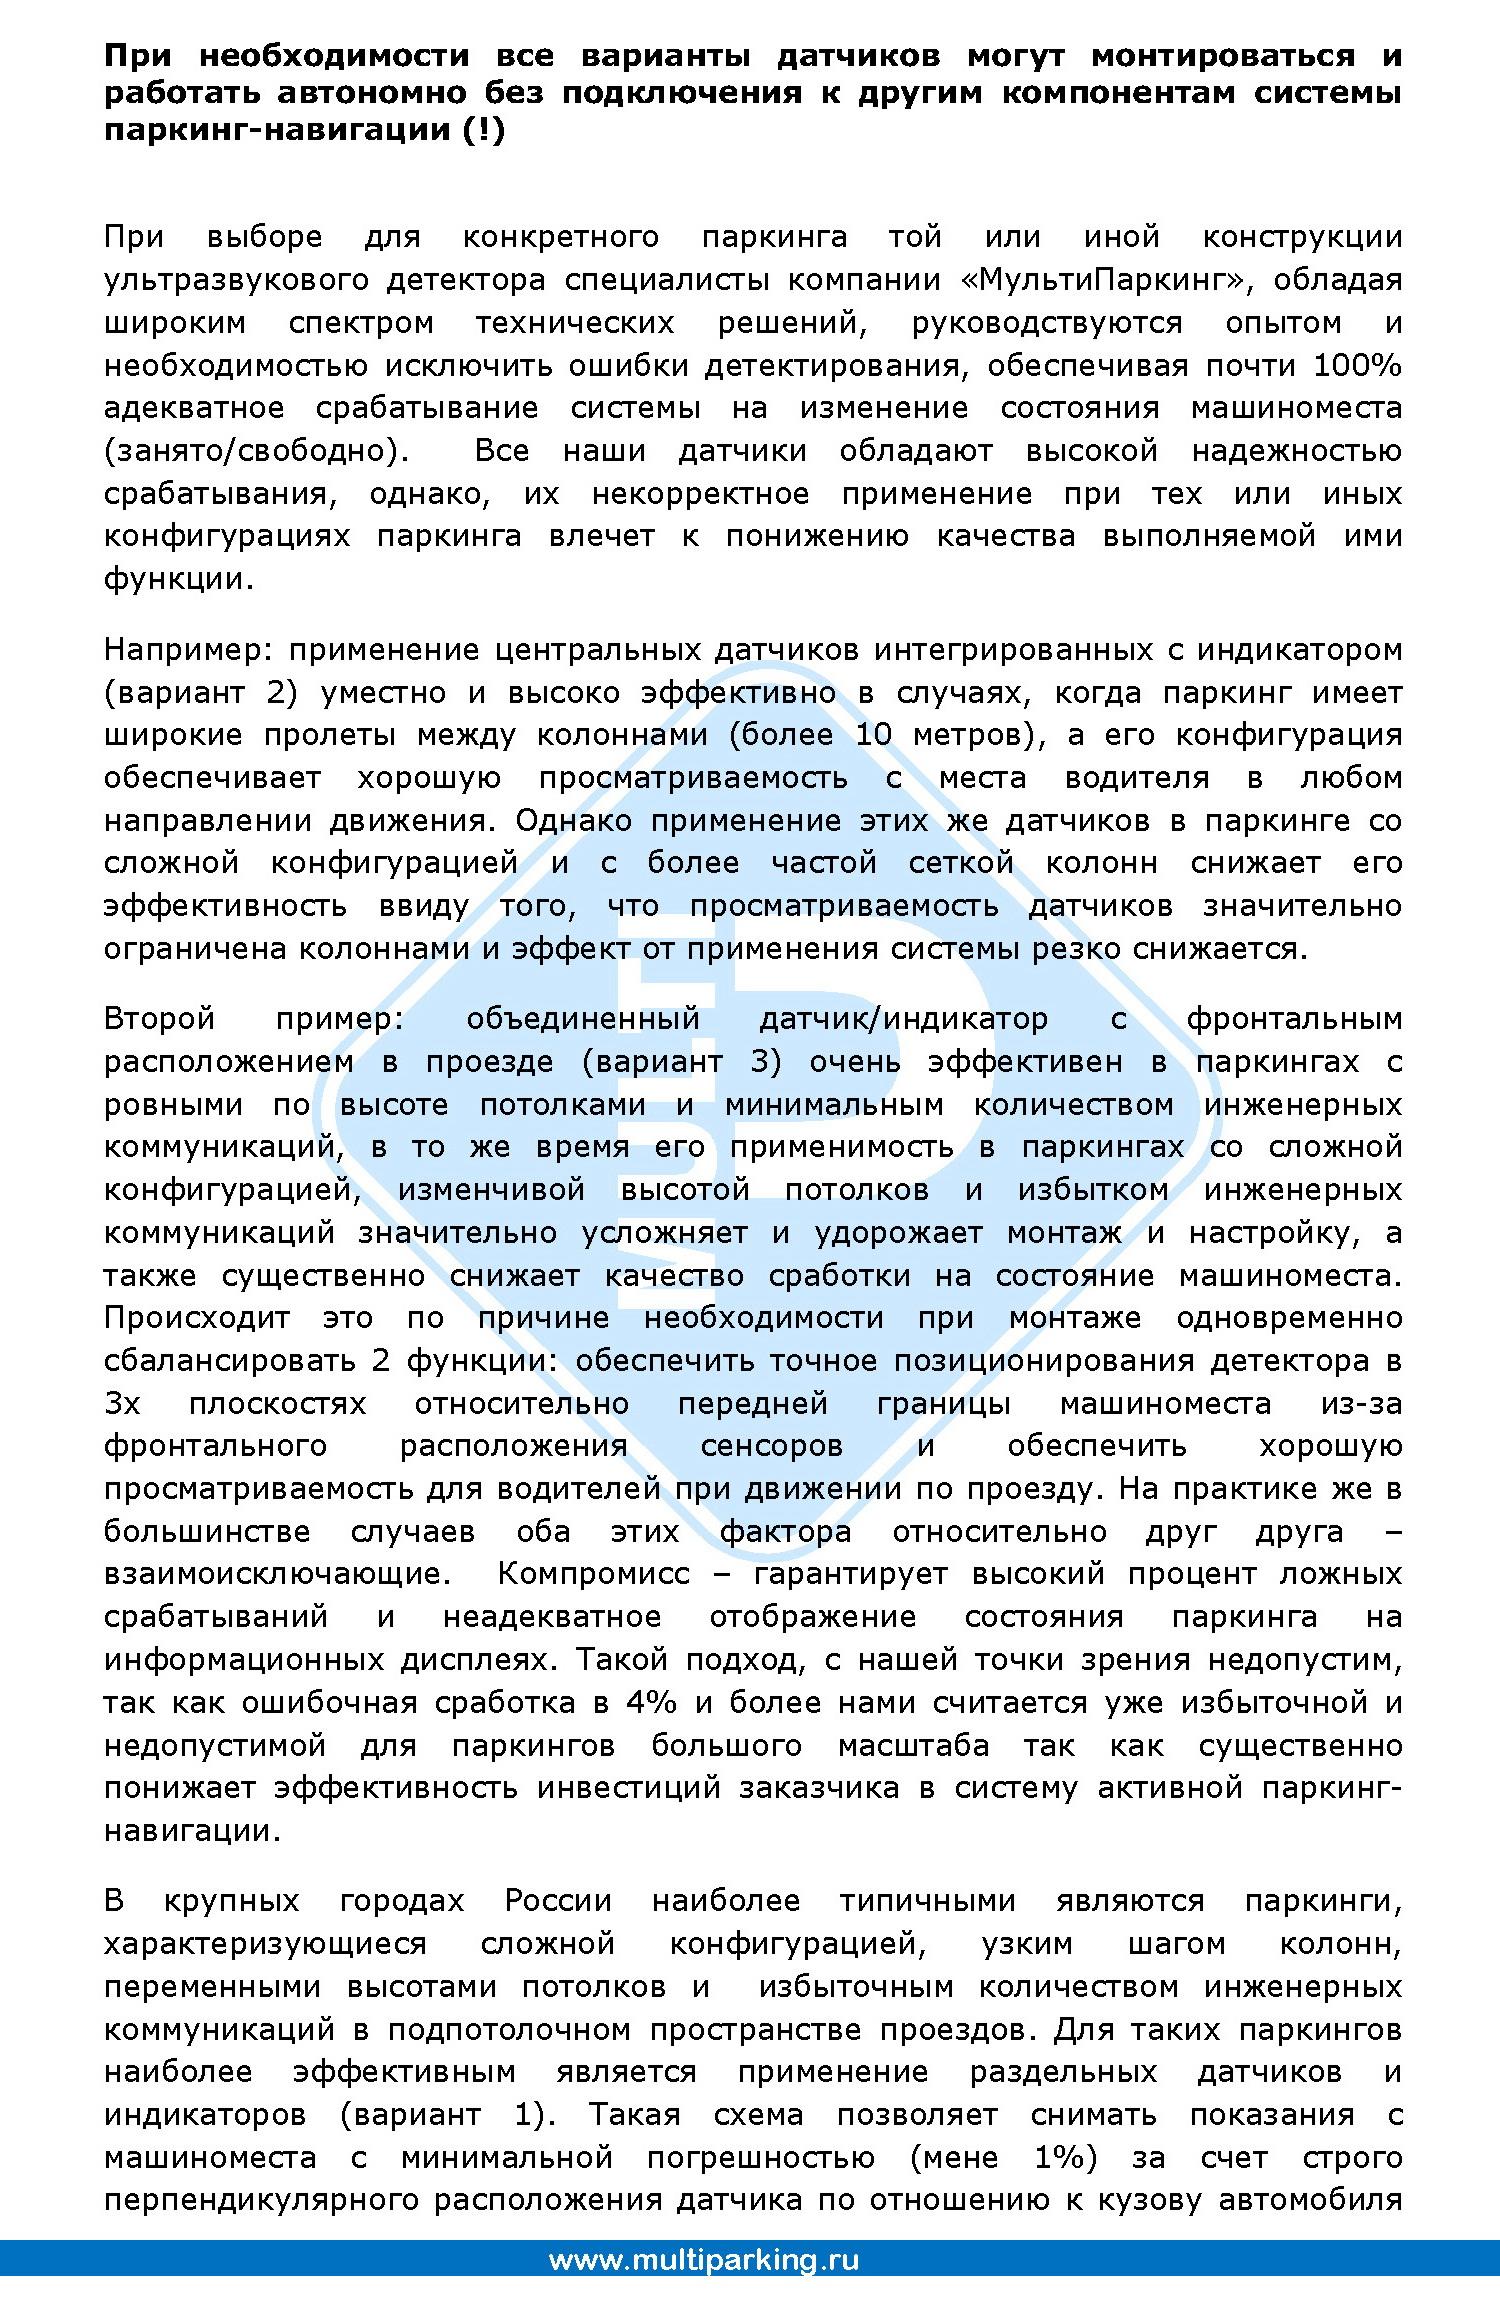 Сравнение УЗД_2013-10-01_Страница_2s